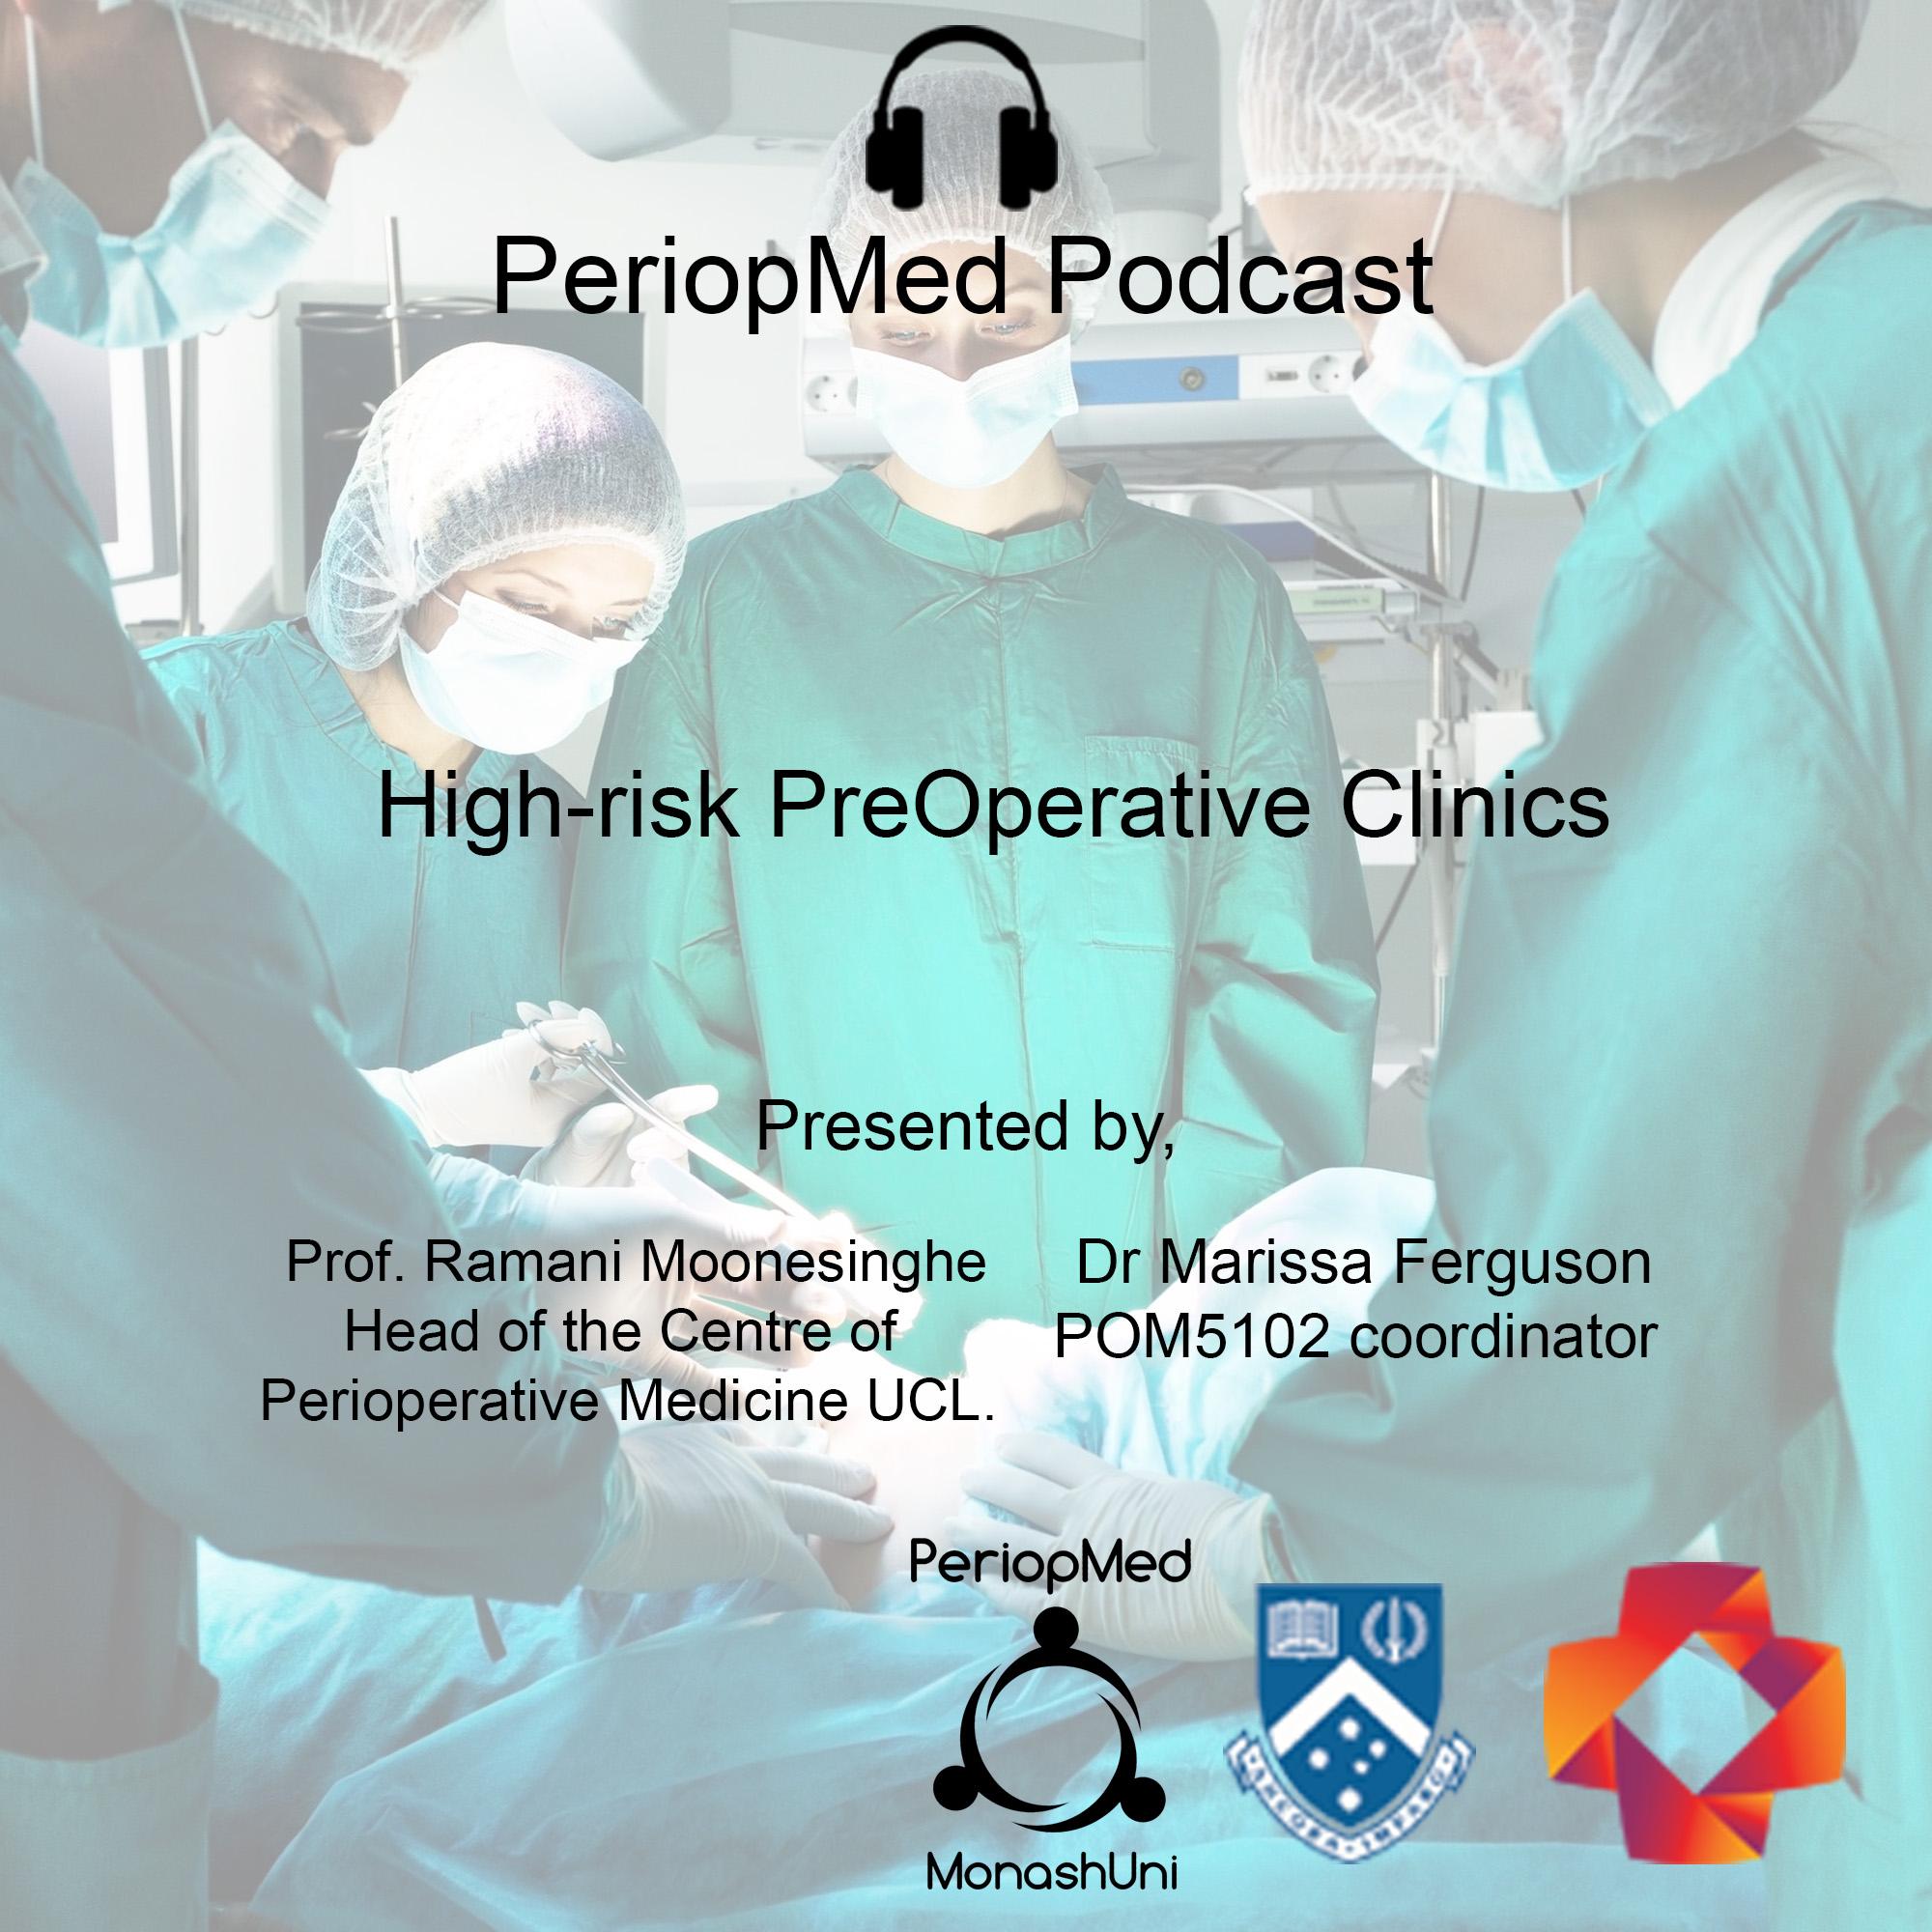 High-risk PreOperative Clinics